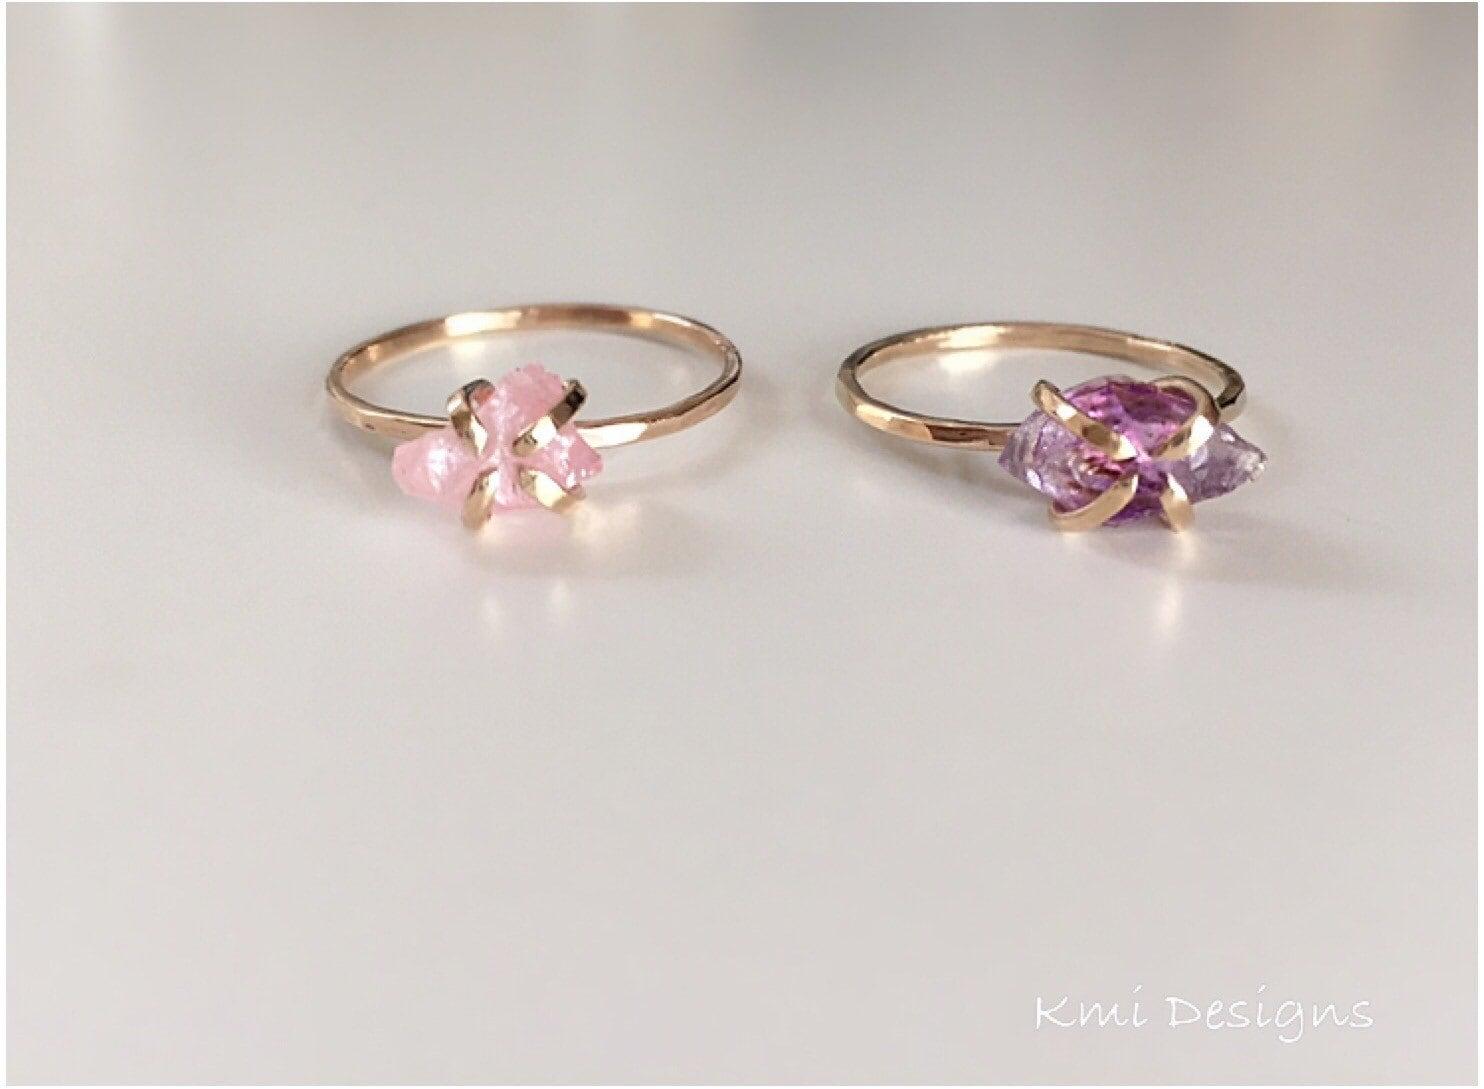 Rose Quartz Ring Engagement Rings Rose Quartz By. Gps Tracking Device Ankle Bracelet. Traditional Gold Wedding Rings. Brass Necklace. Purse Bracelet. 20 Diamond. Big Gold Bracelet. Large Gold Lockets. Golden Bangles